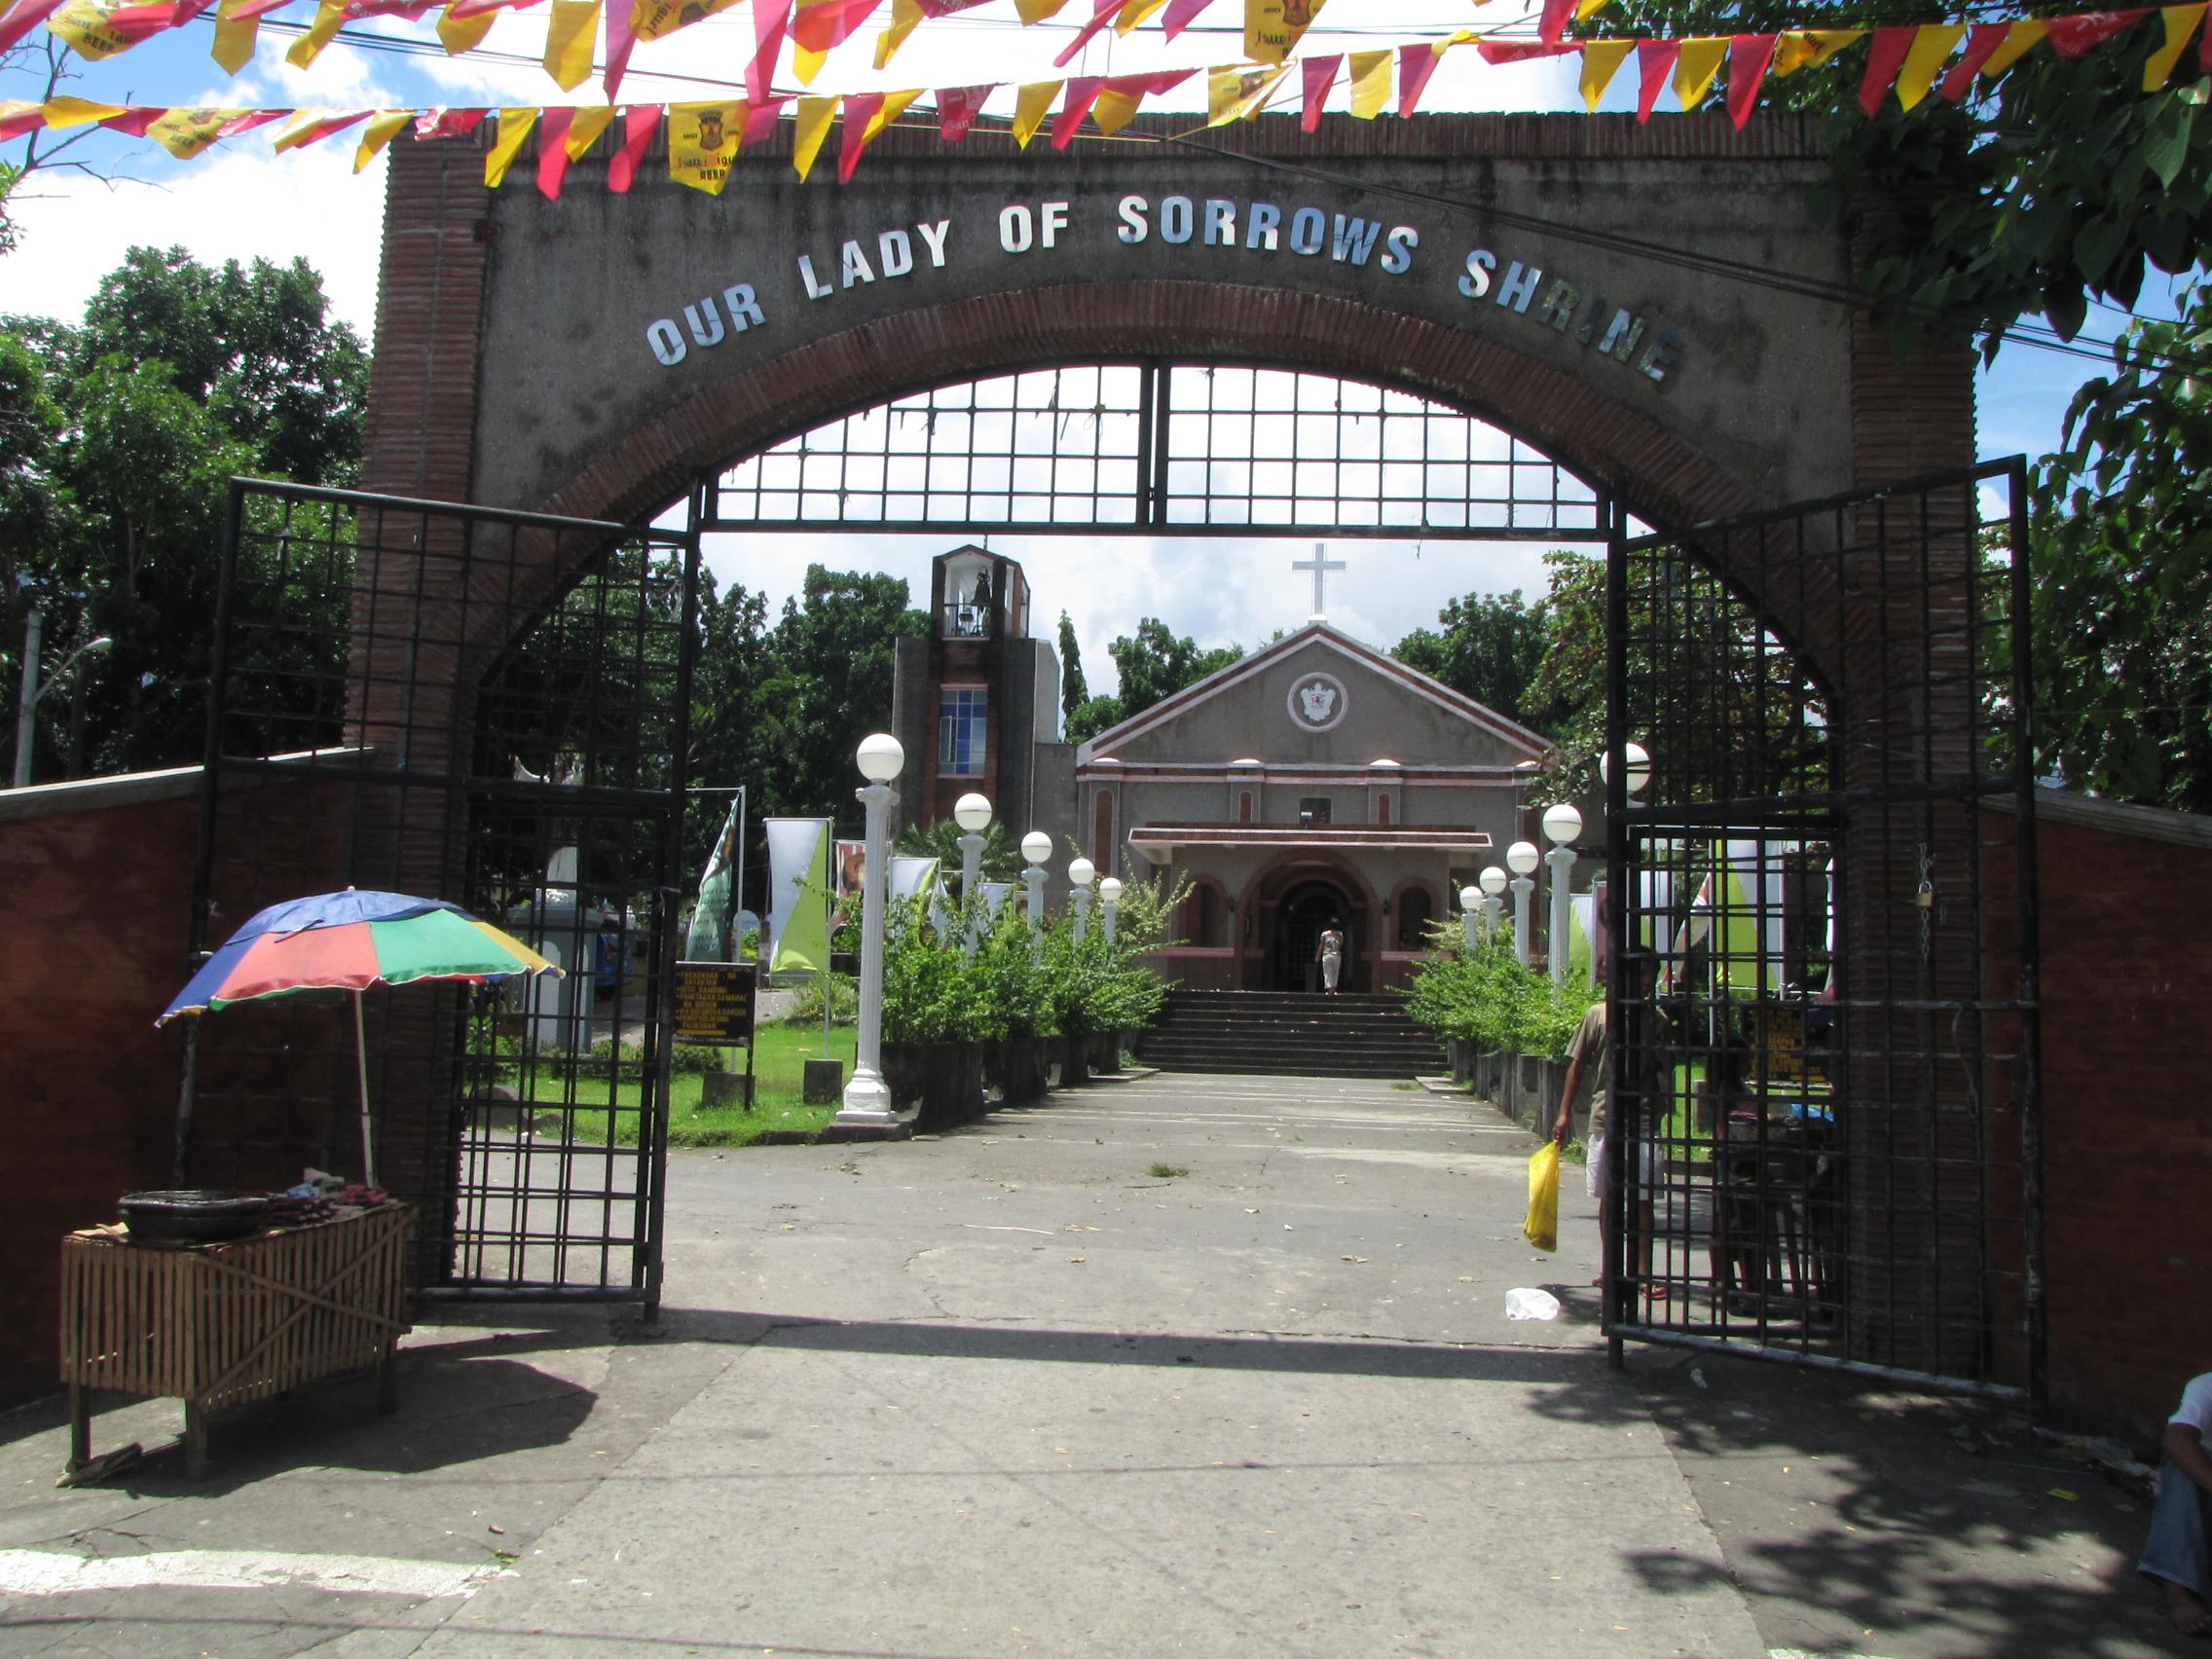 Dolores Quezon Philippines  Universal Stewardship